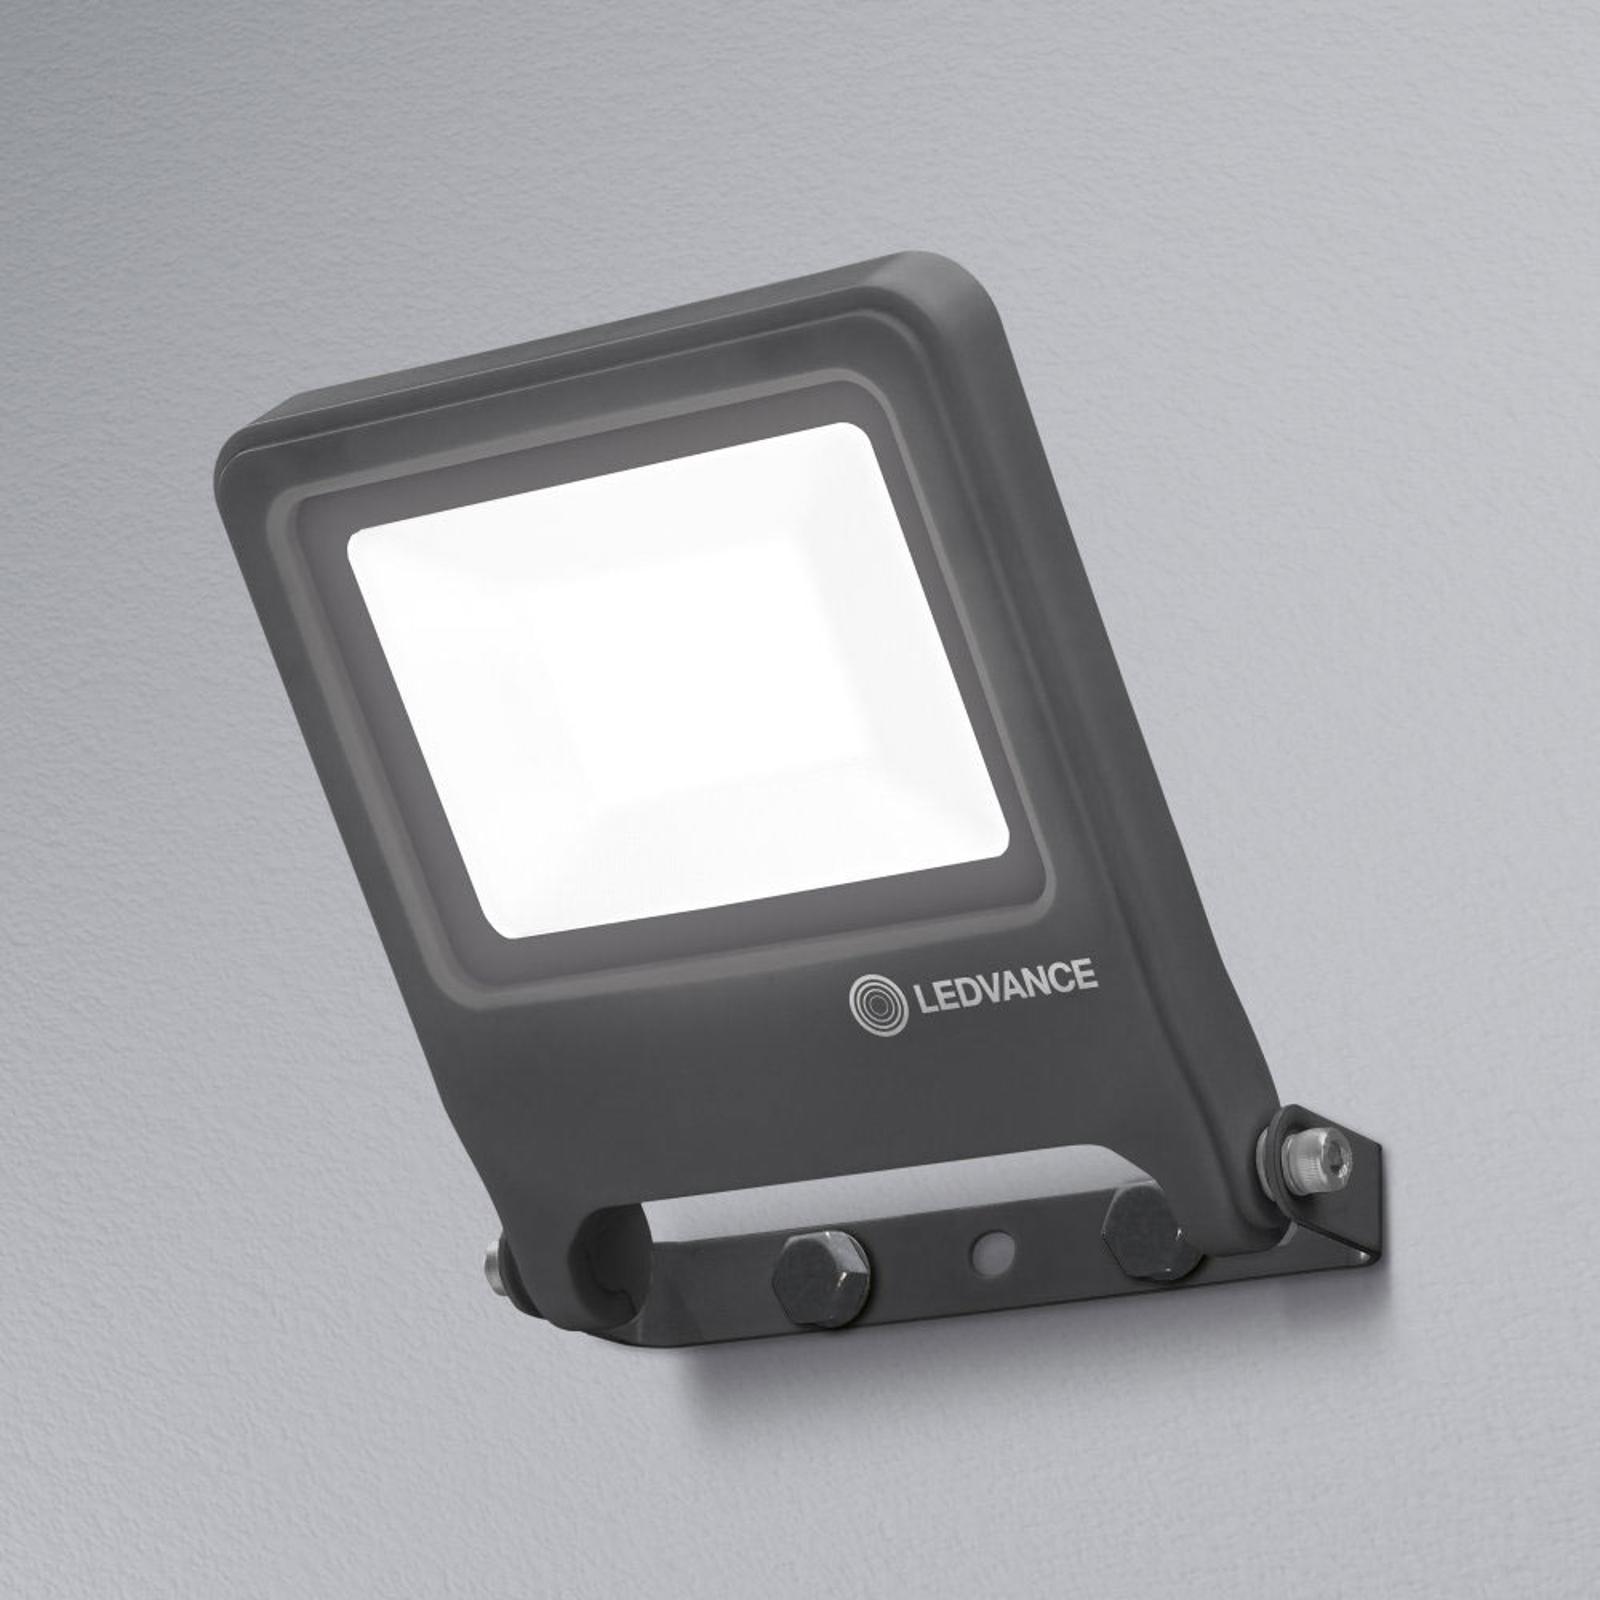 LEDVANCE Endura Floodlight LED udendørs spot 20W